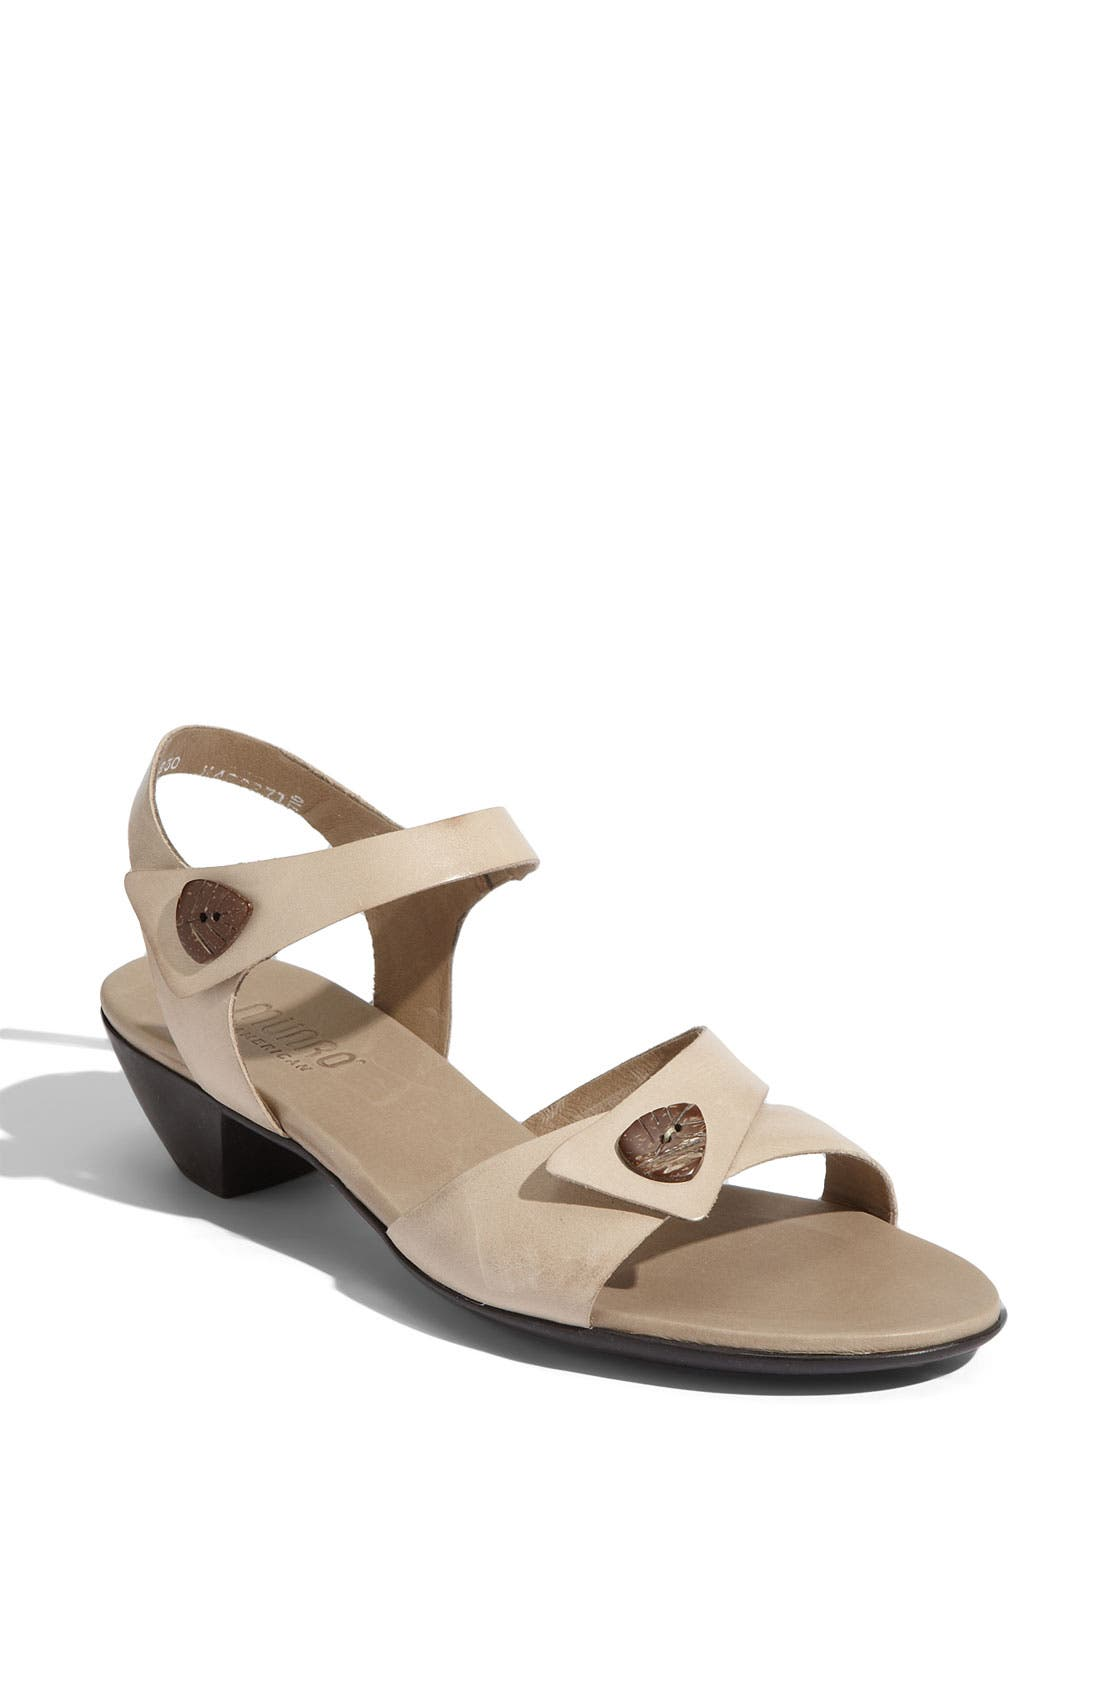 Alternate Image 1 Selected - Munro 'Palau' Sandal